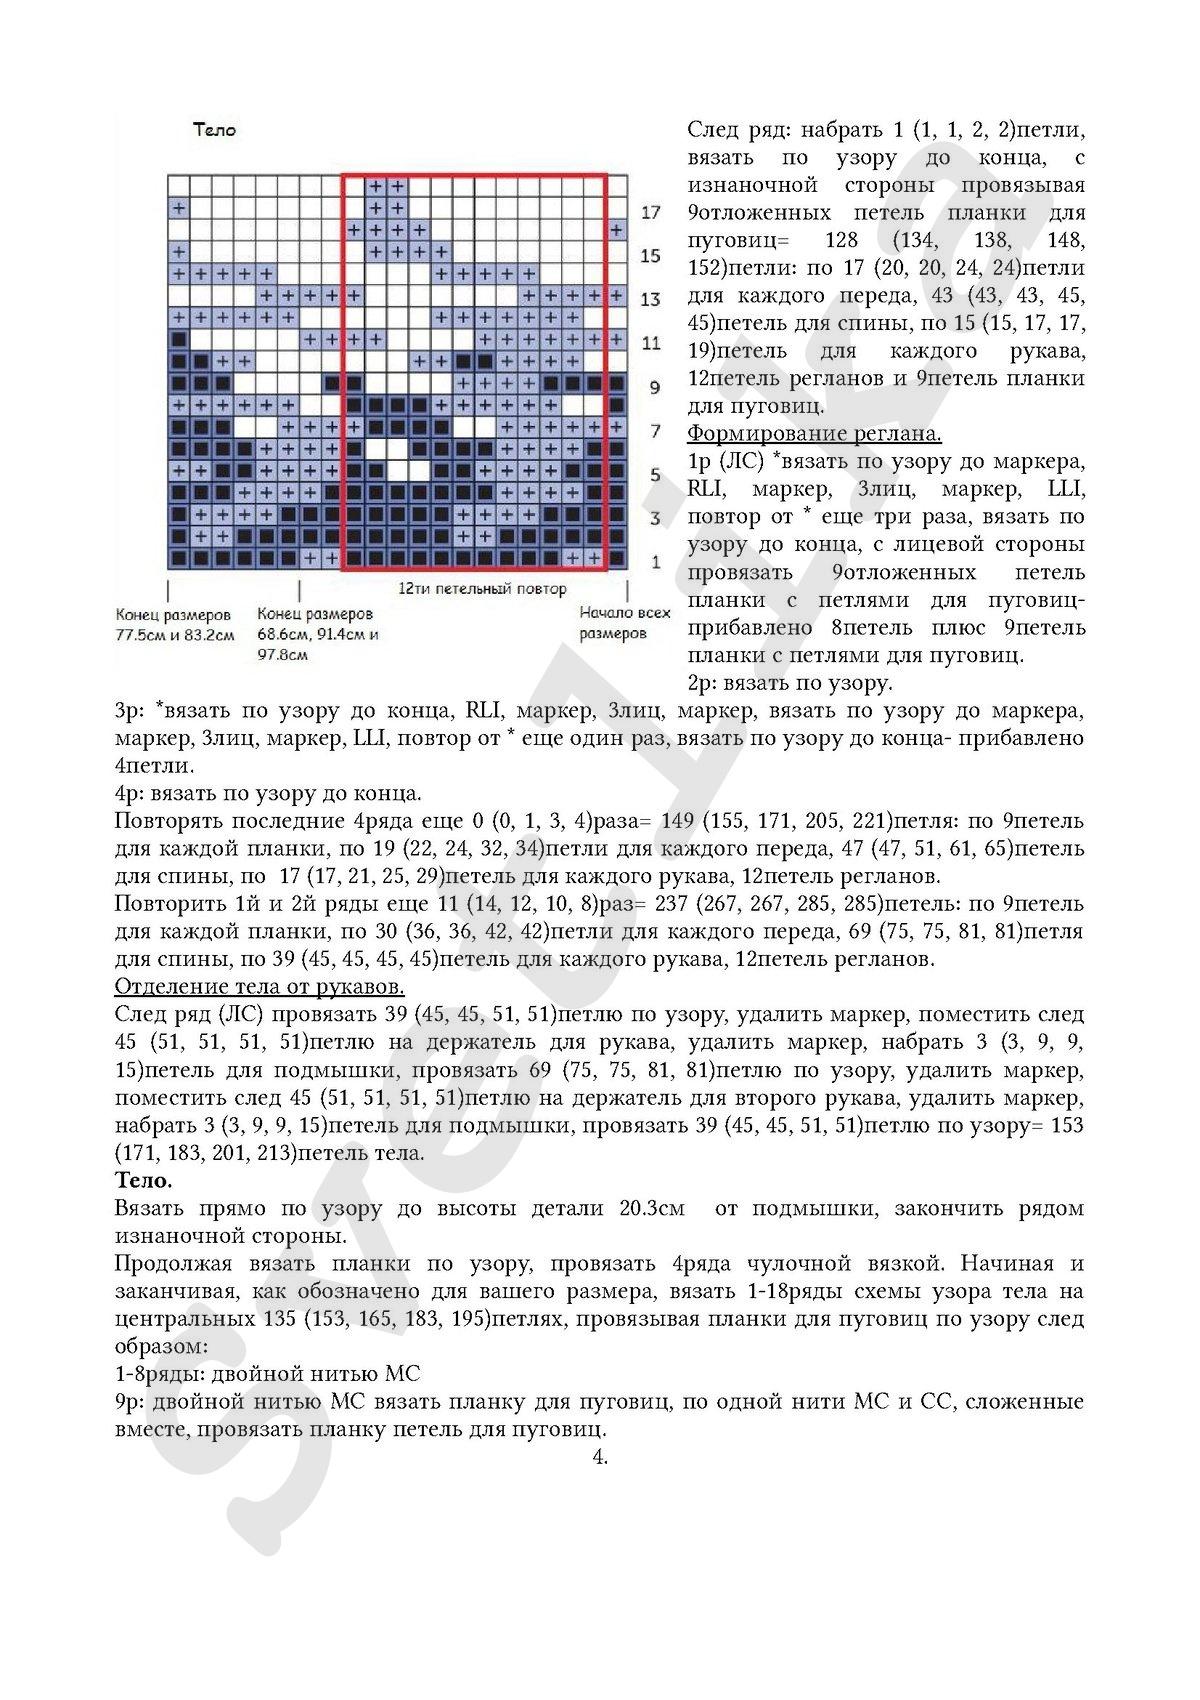 https://img-fotki.yandex.ru/get/892397/125862467.117/0_1d3e6a_2f749295_orig